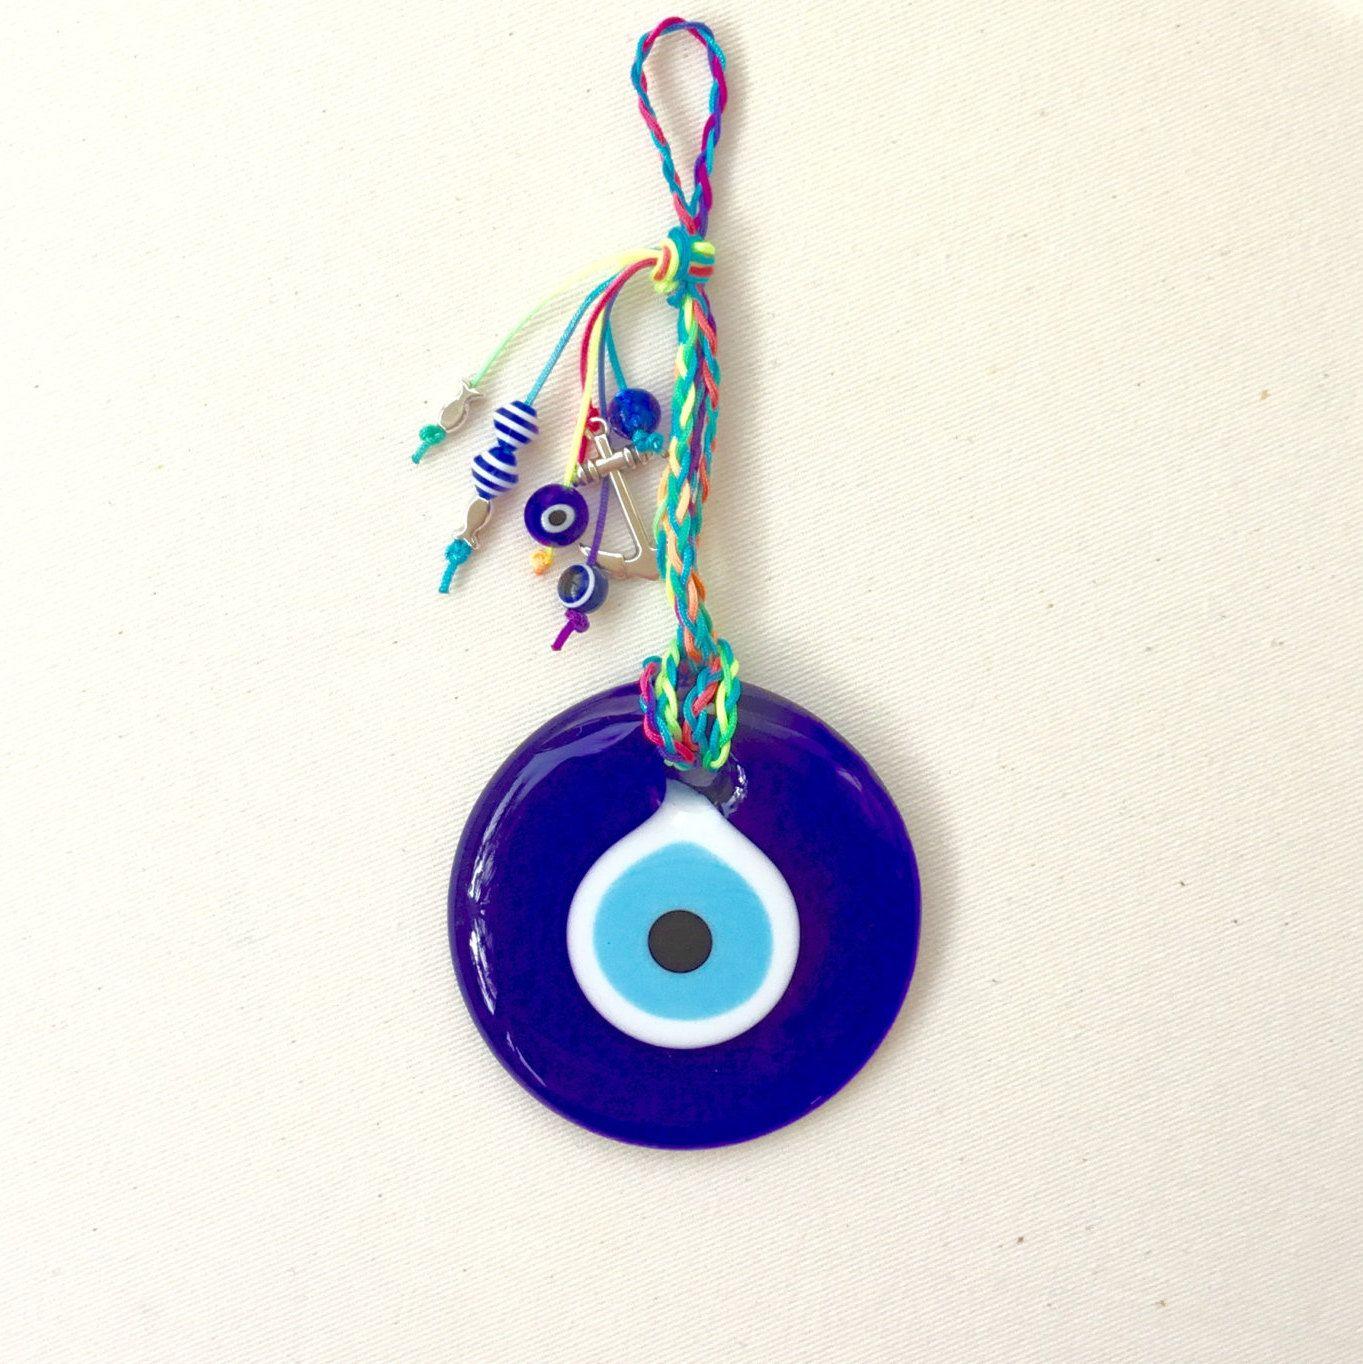 Round Evil Eye Charm Good Luck Charm Evil Eyes Nazar Talisman